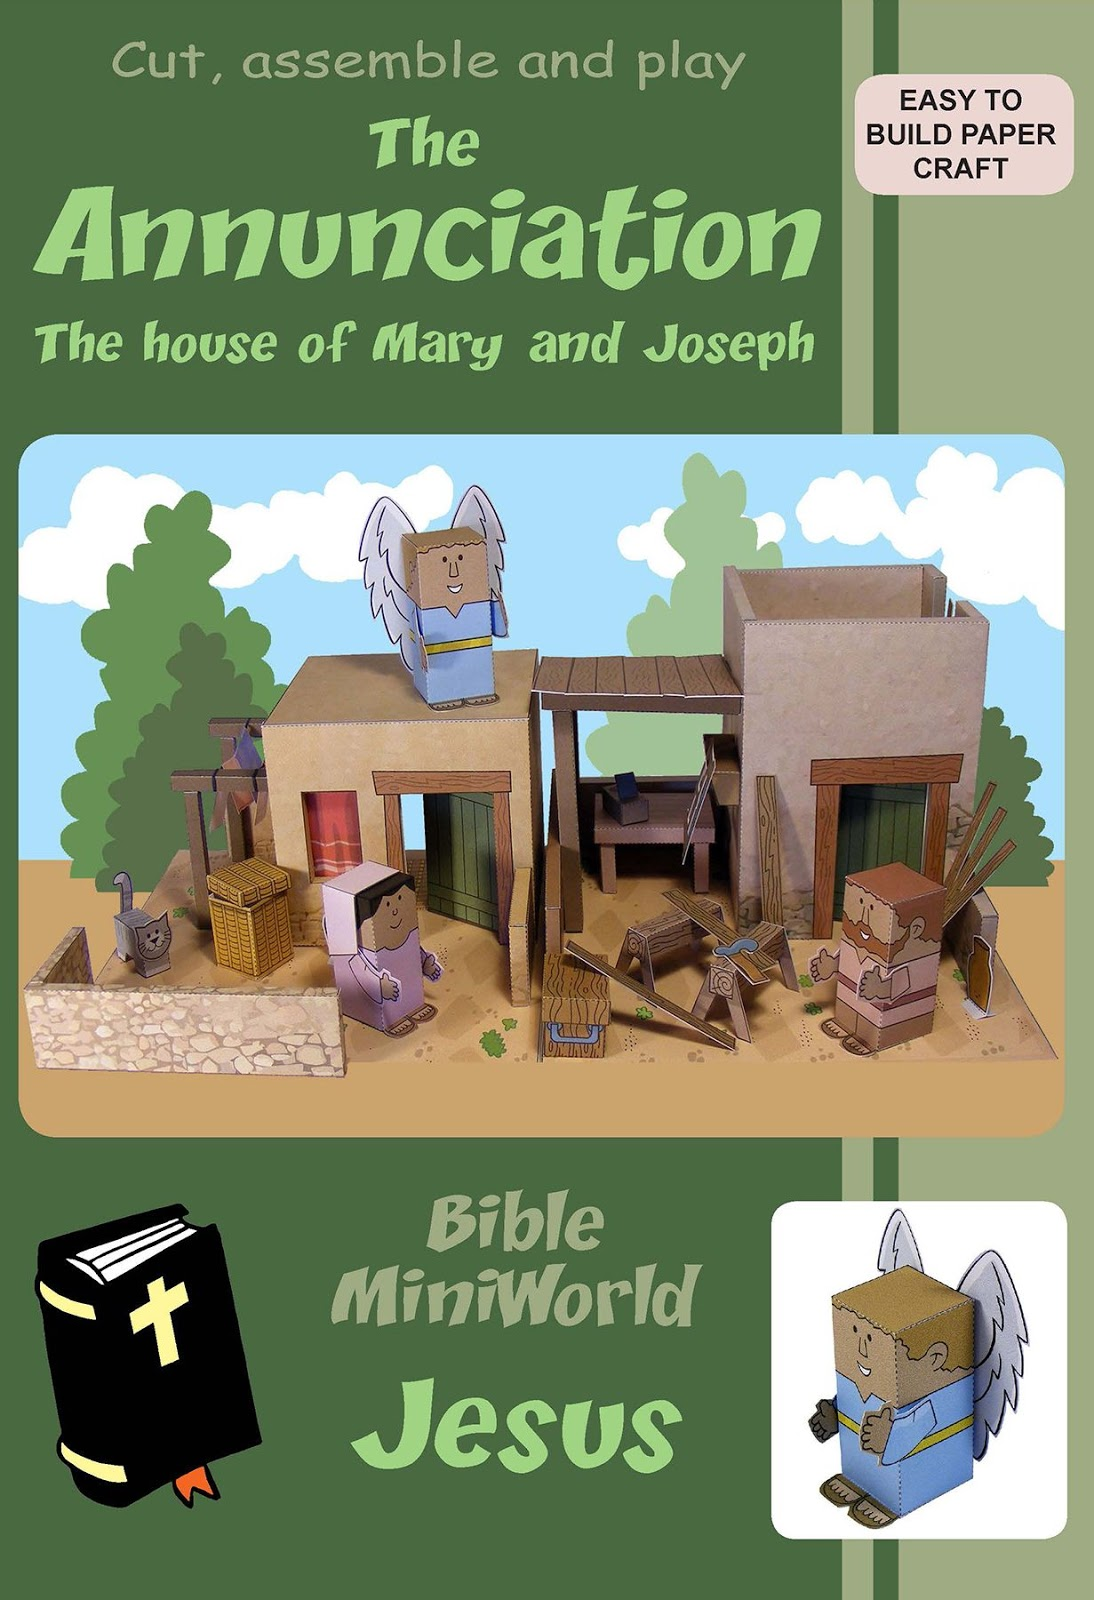 my little house bible miniworld jesus